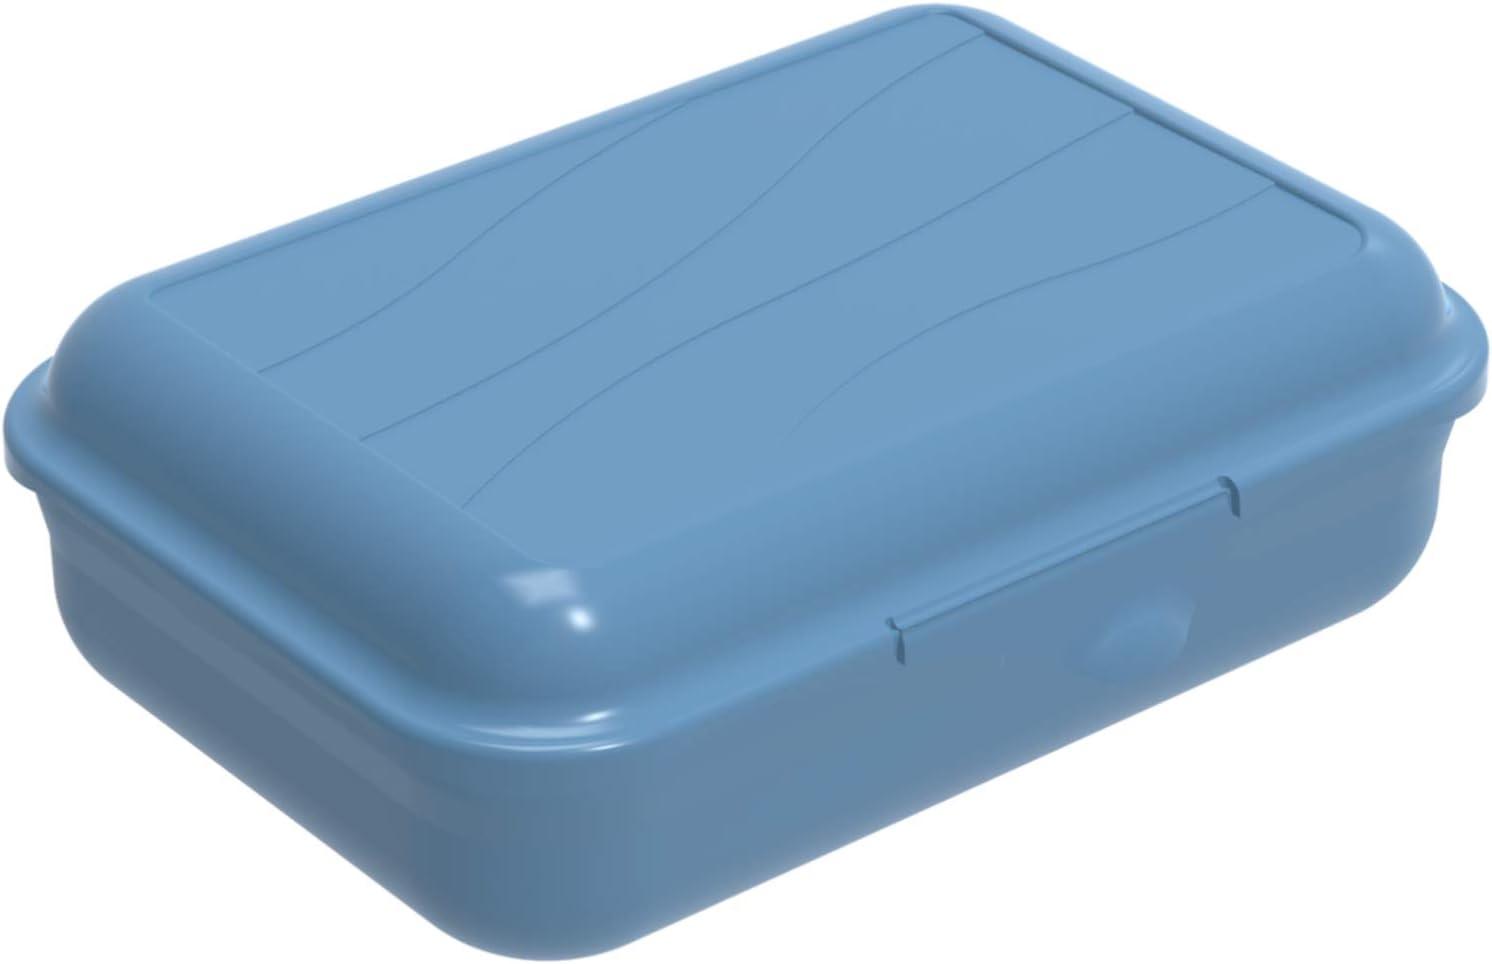 Lata Vesper 0.9l con partici/ón removible azul S 0.9l 17.7 x 12.9 x 6.0 cm Rotho Fun Pl/ástico PP sin BPA